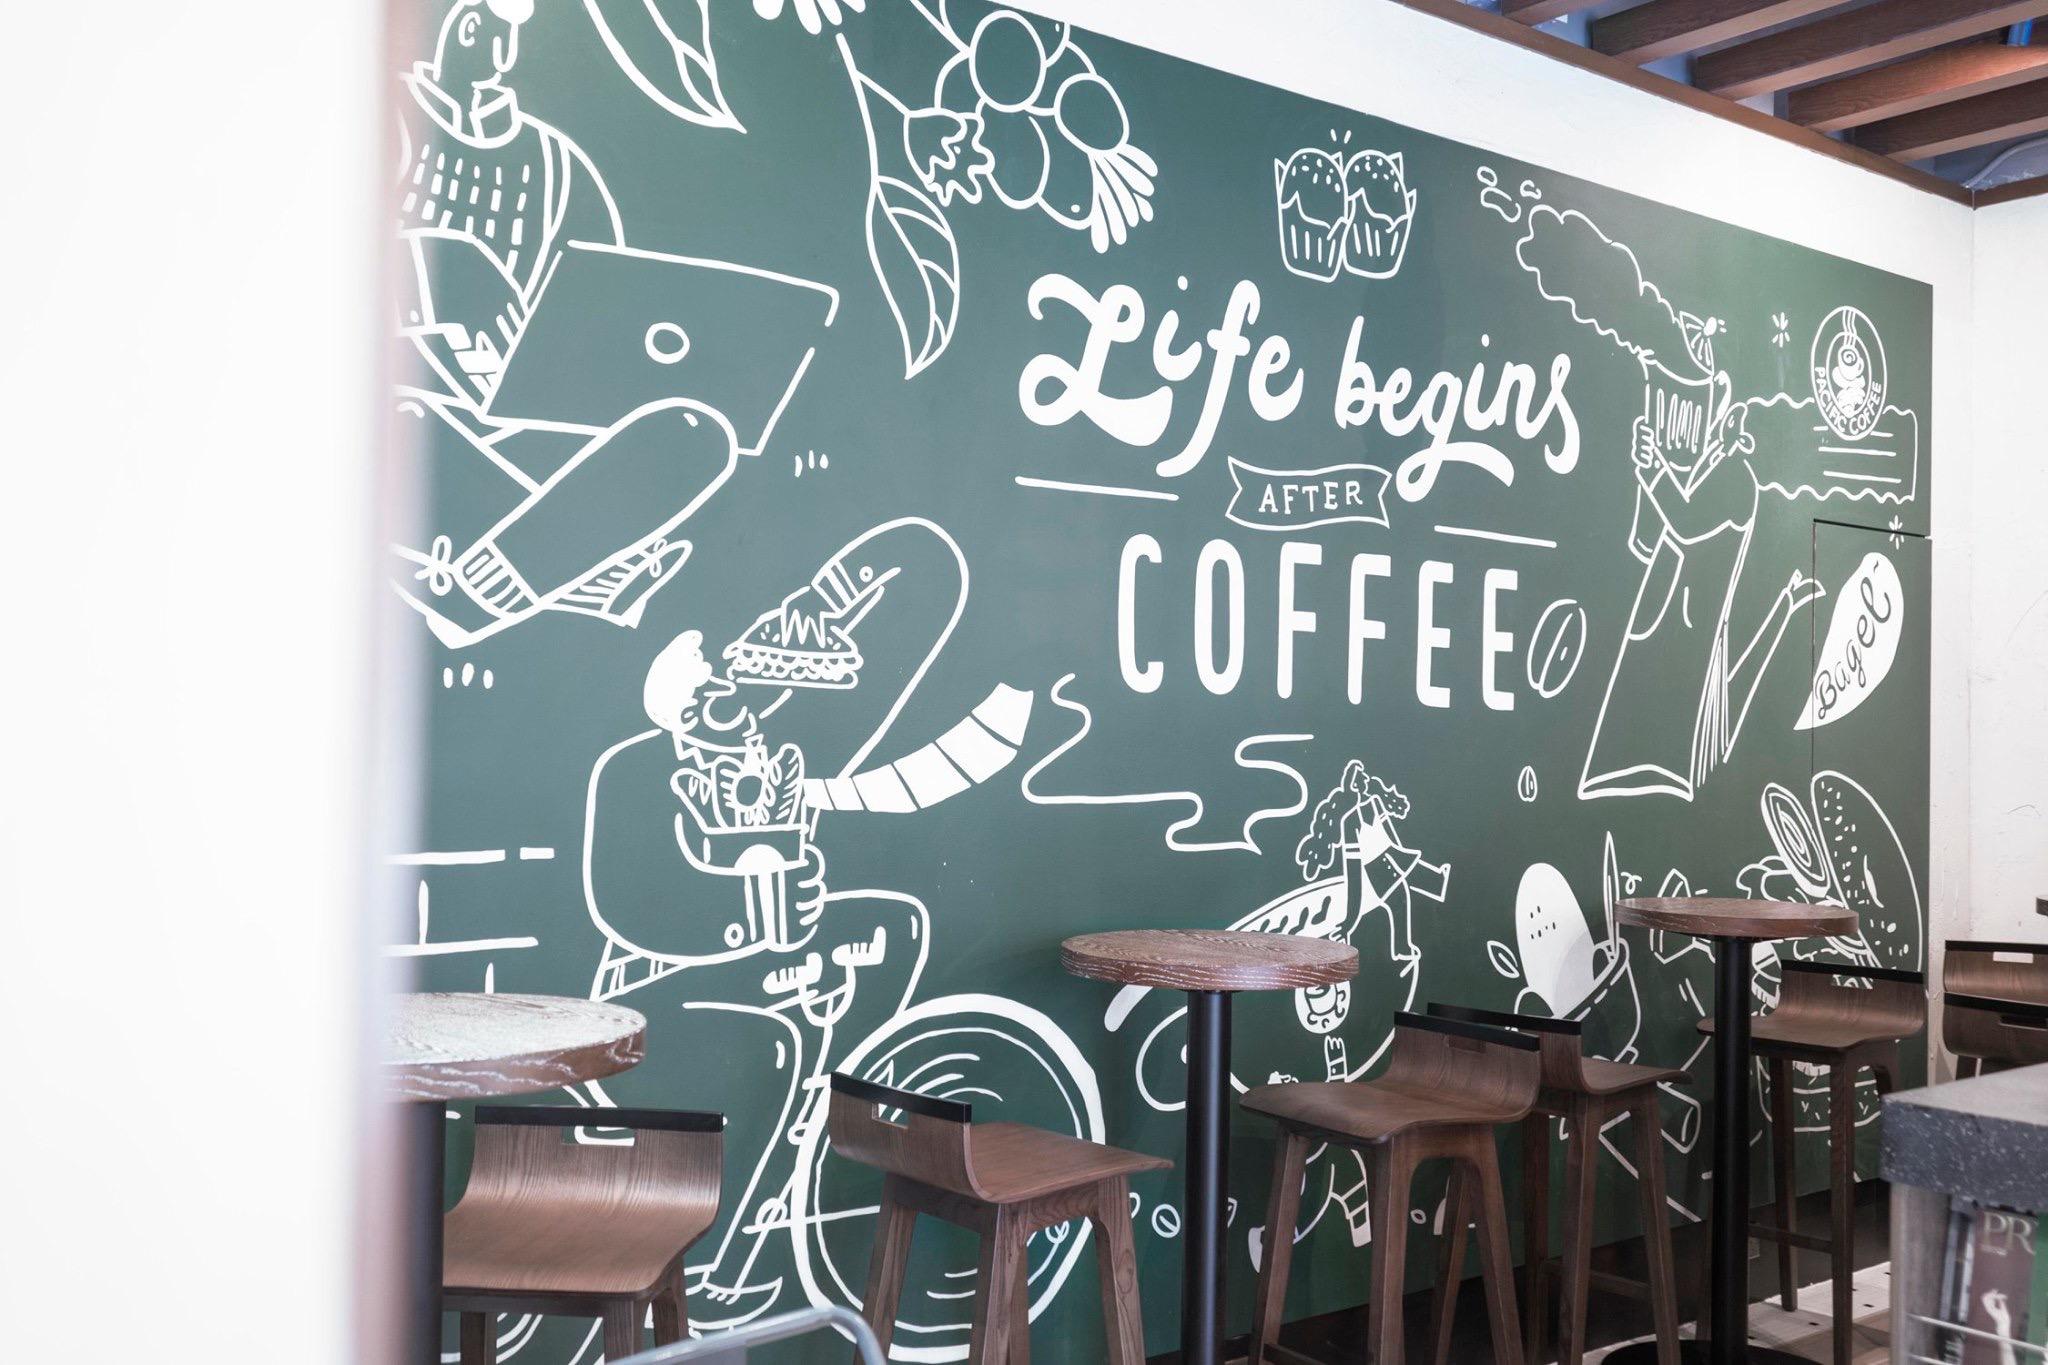 上環 Pacific Coffee